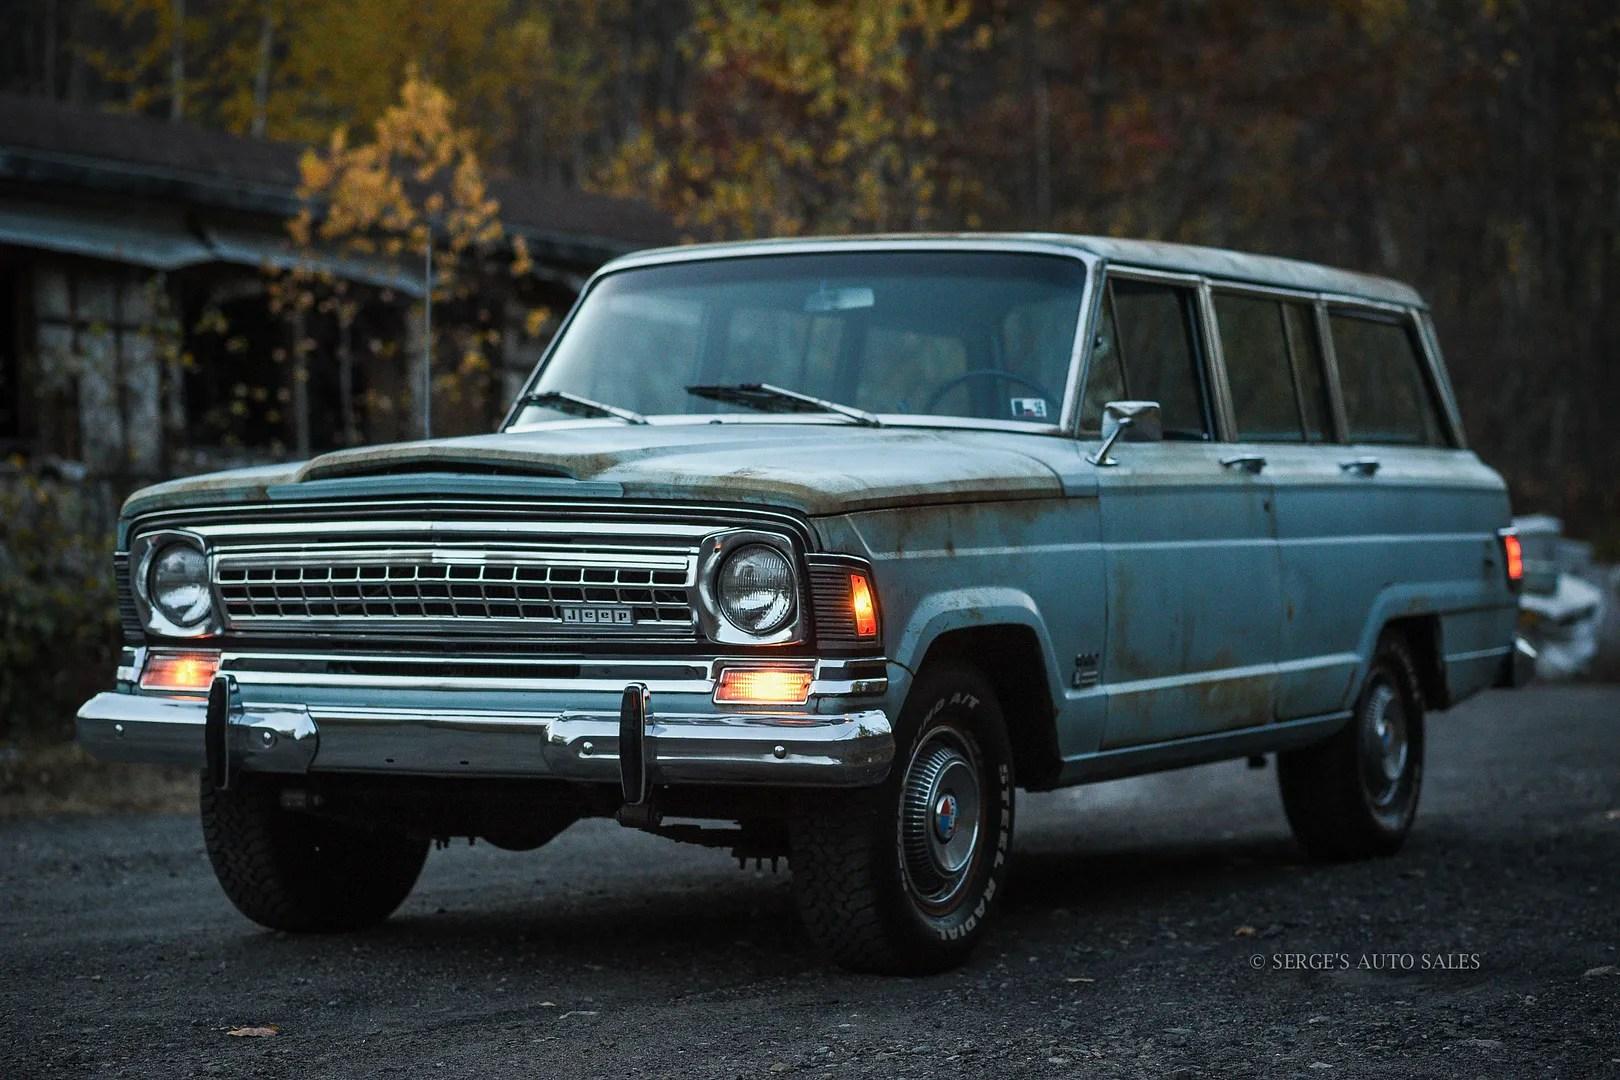 1972 jeep wagoneer survivor serges auto sales of northeast pa. Black Bedroom Furniture Sets. Home Design Ideas